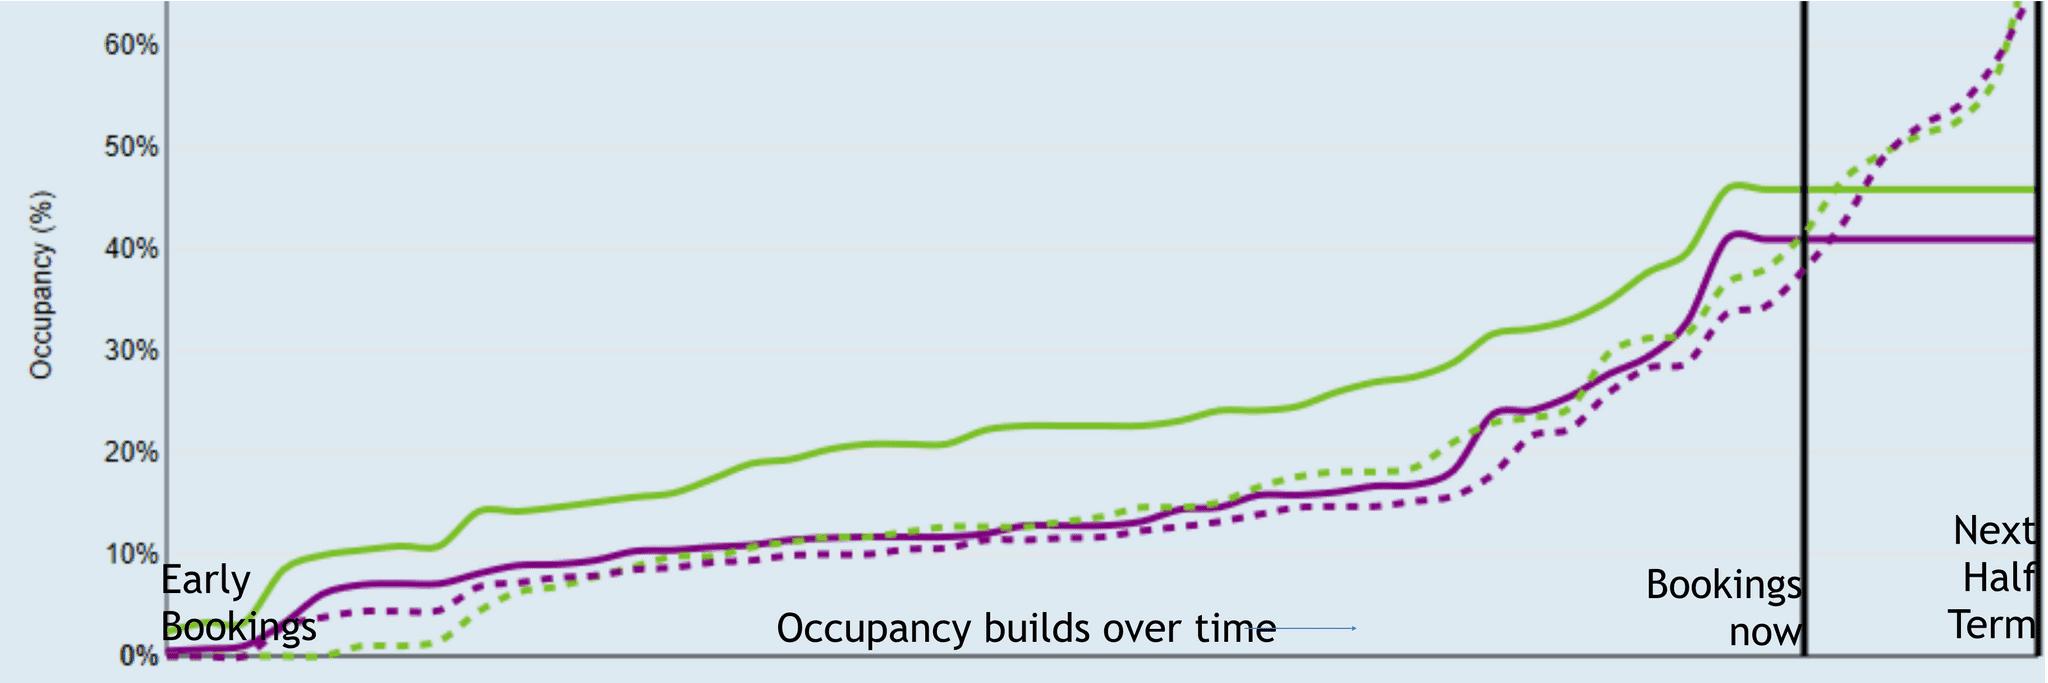 Bookings graph